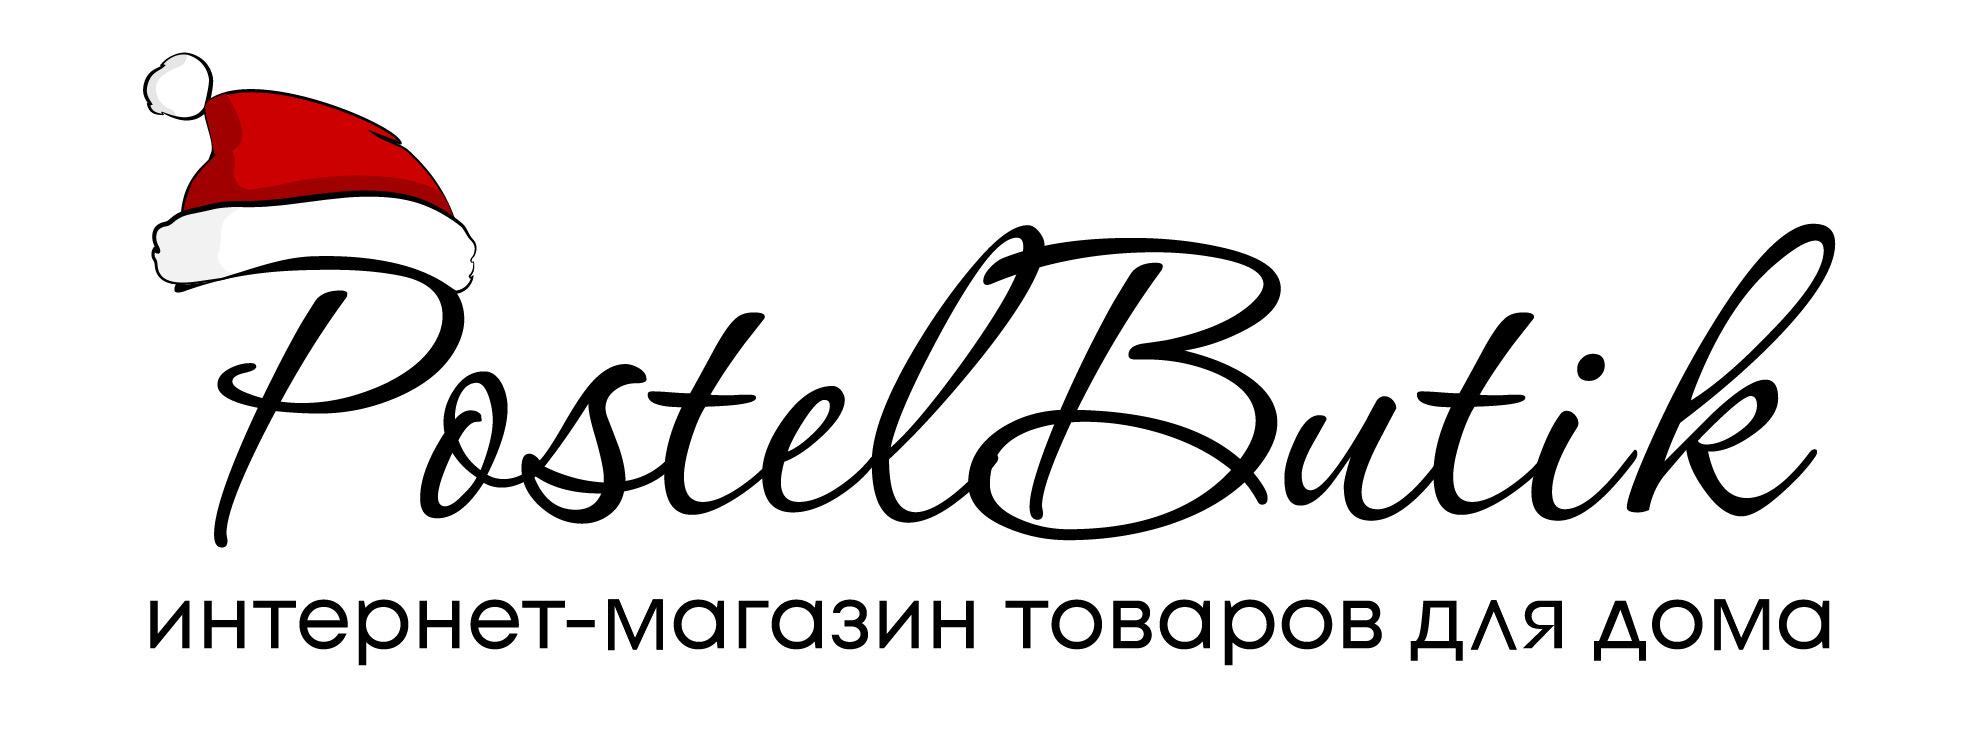 Постель Бутик